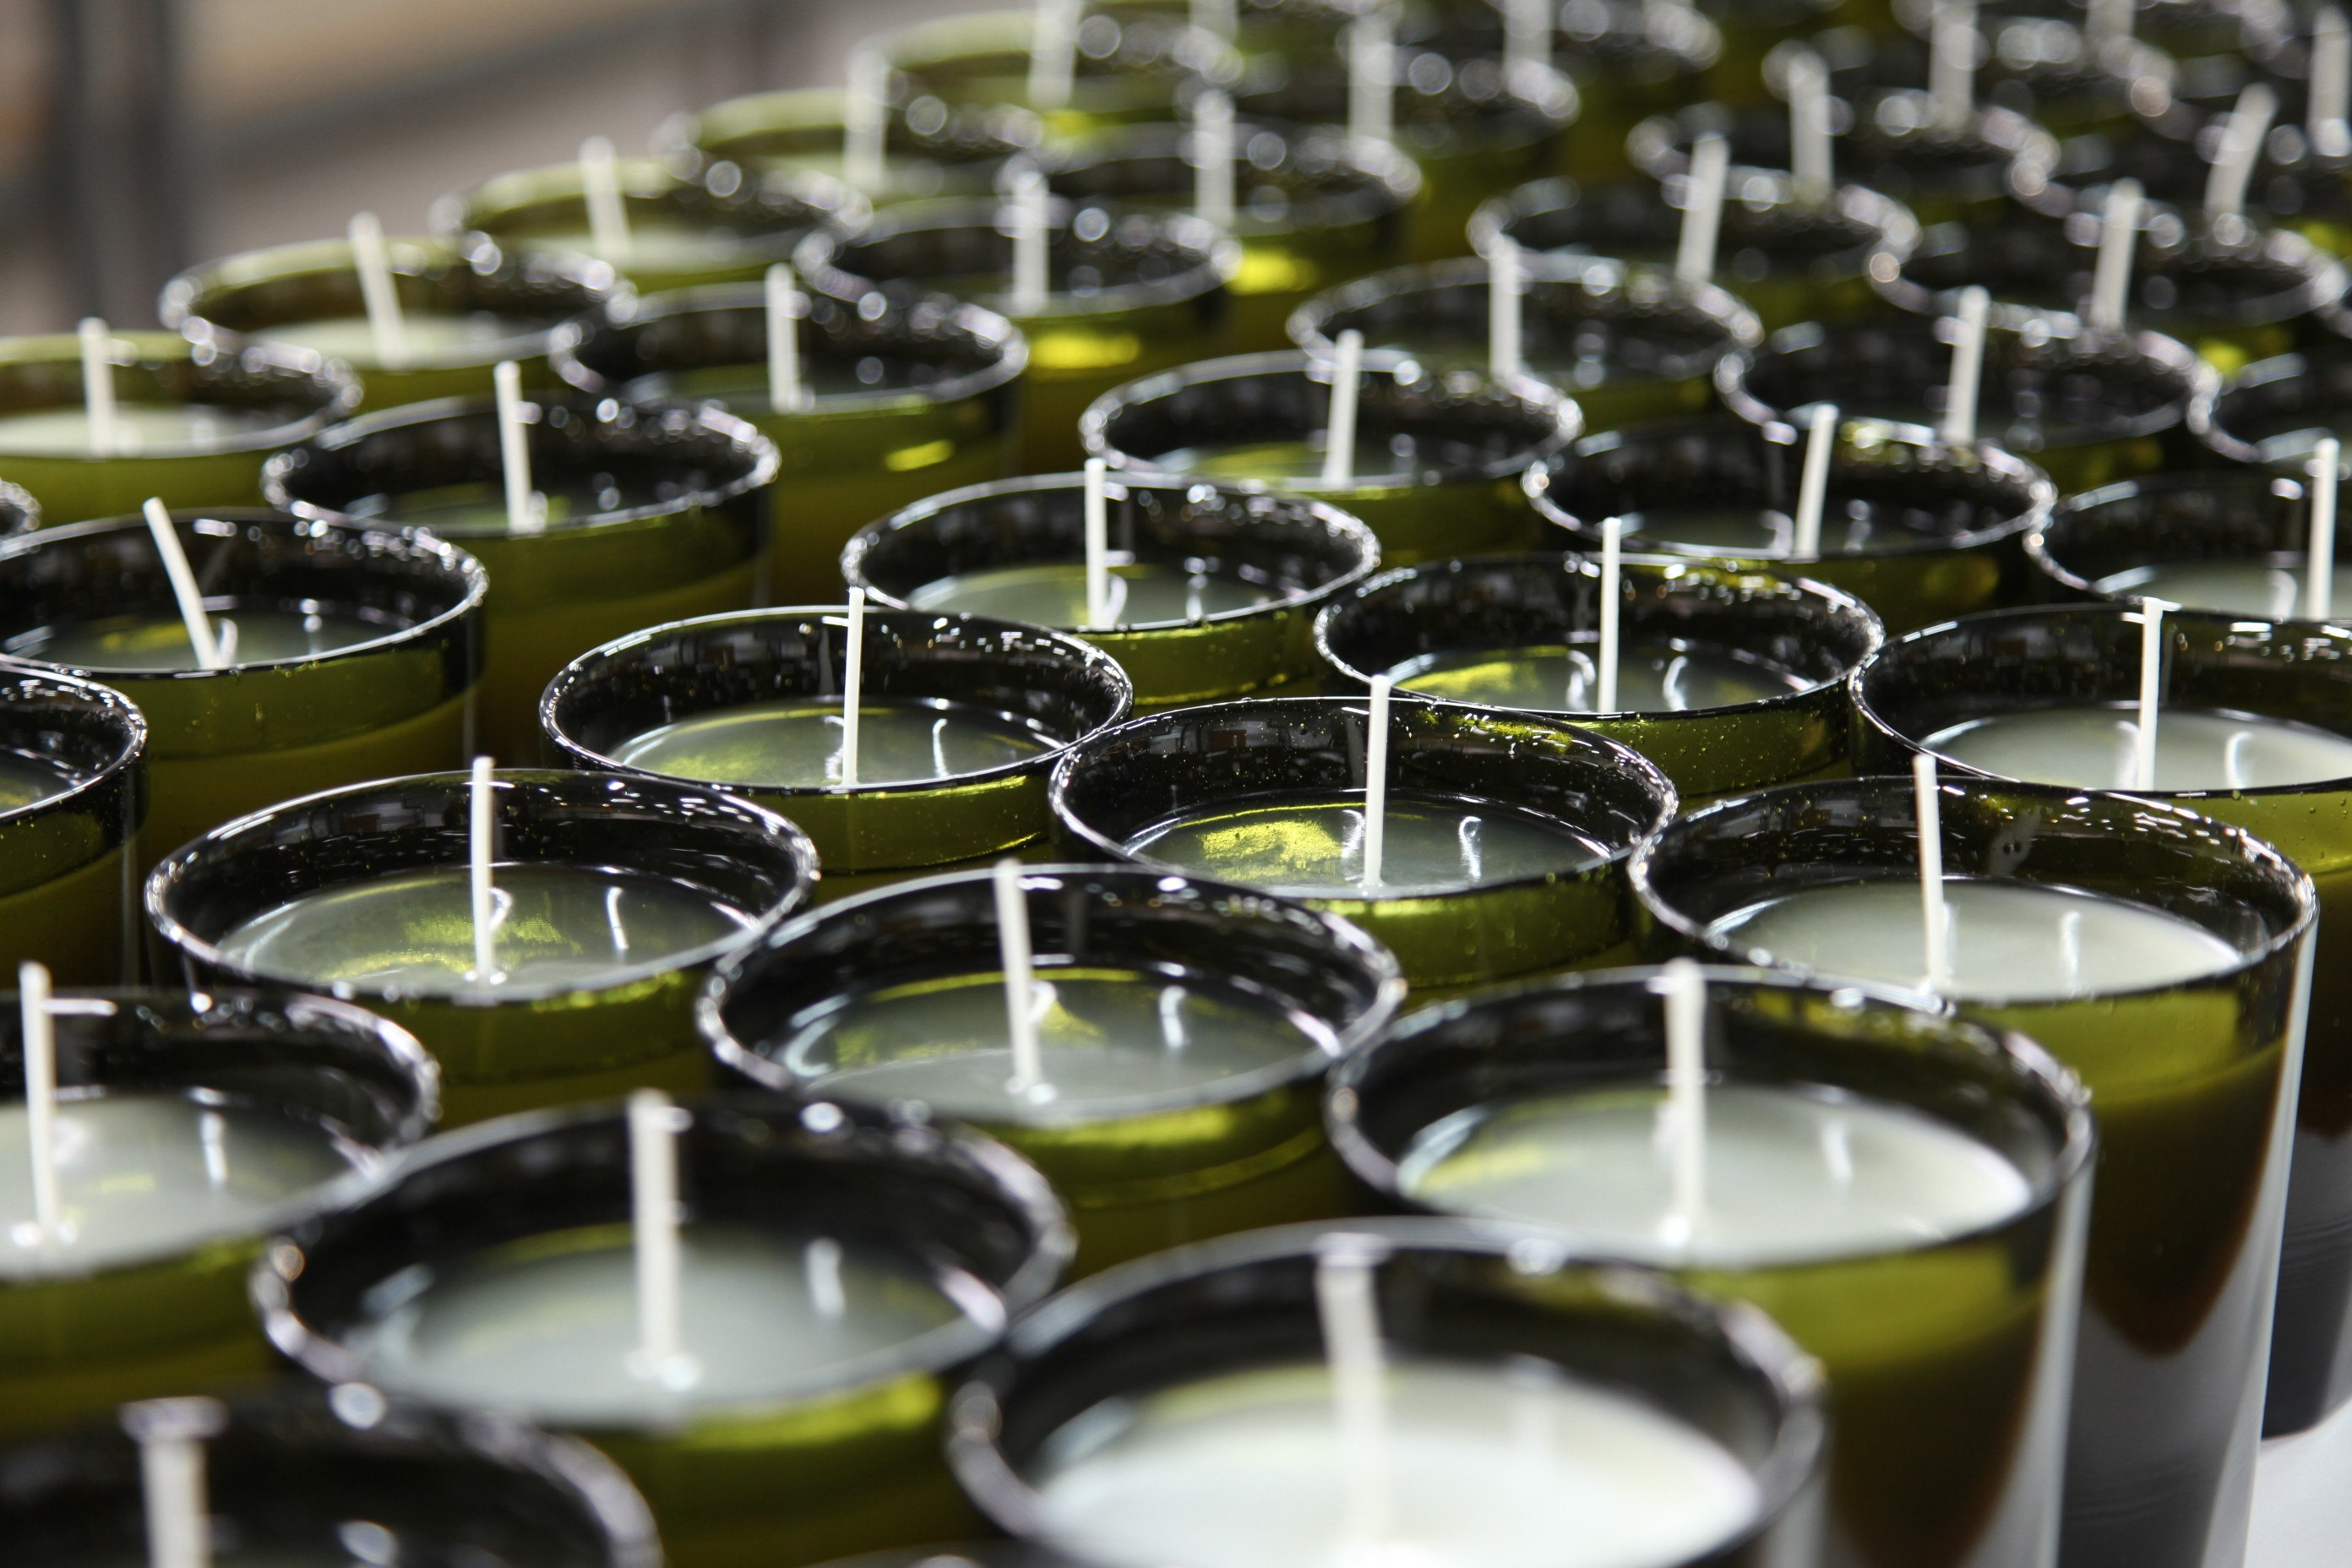 Craftsmanship Spotlight: The Legendary Candles of Cire Trudon